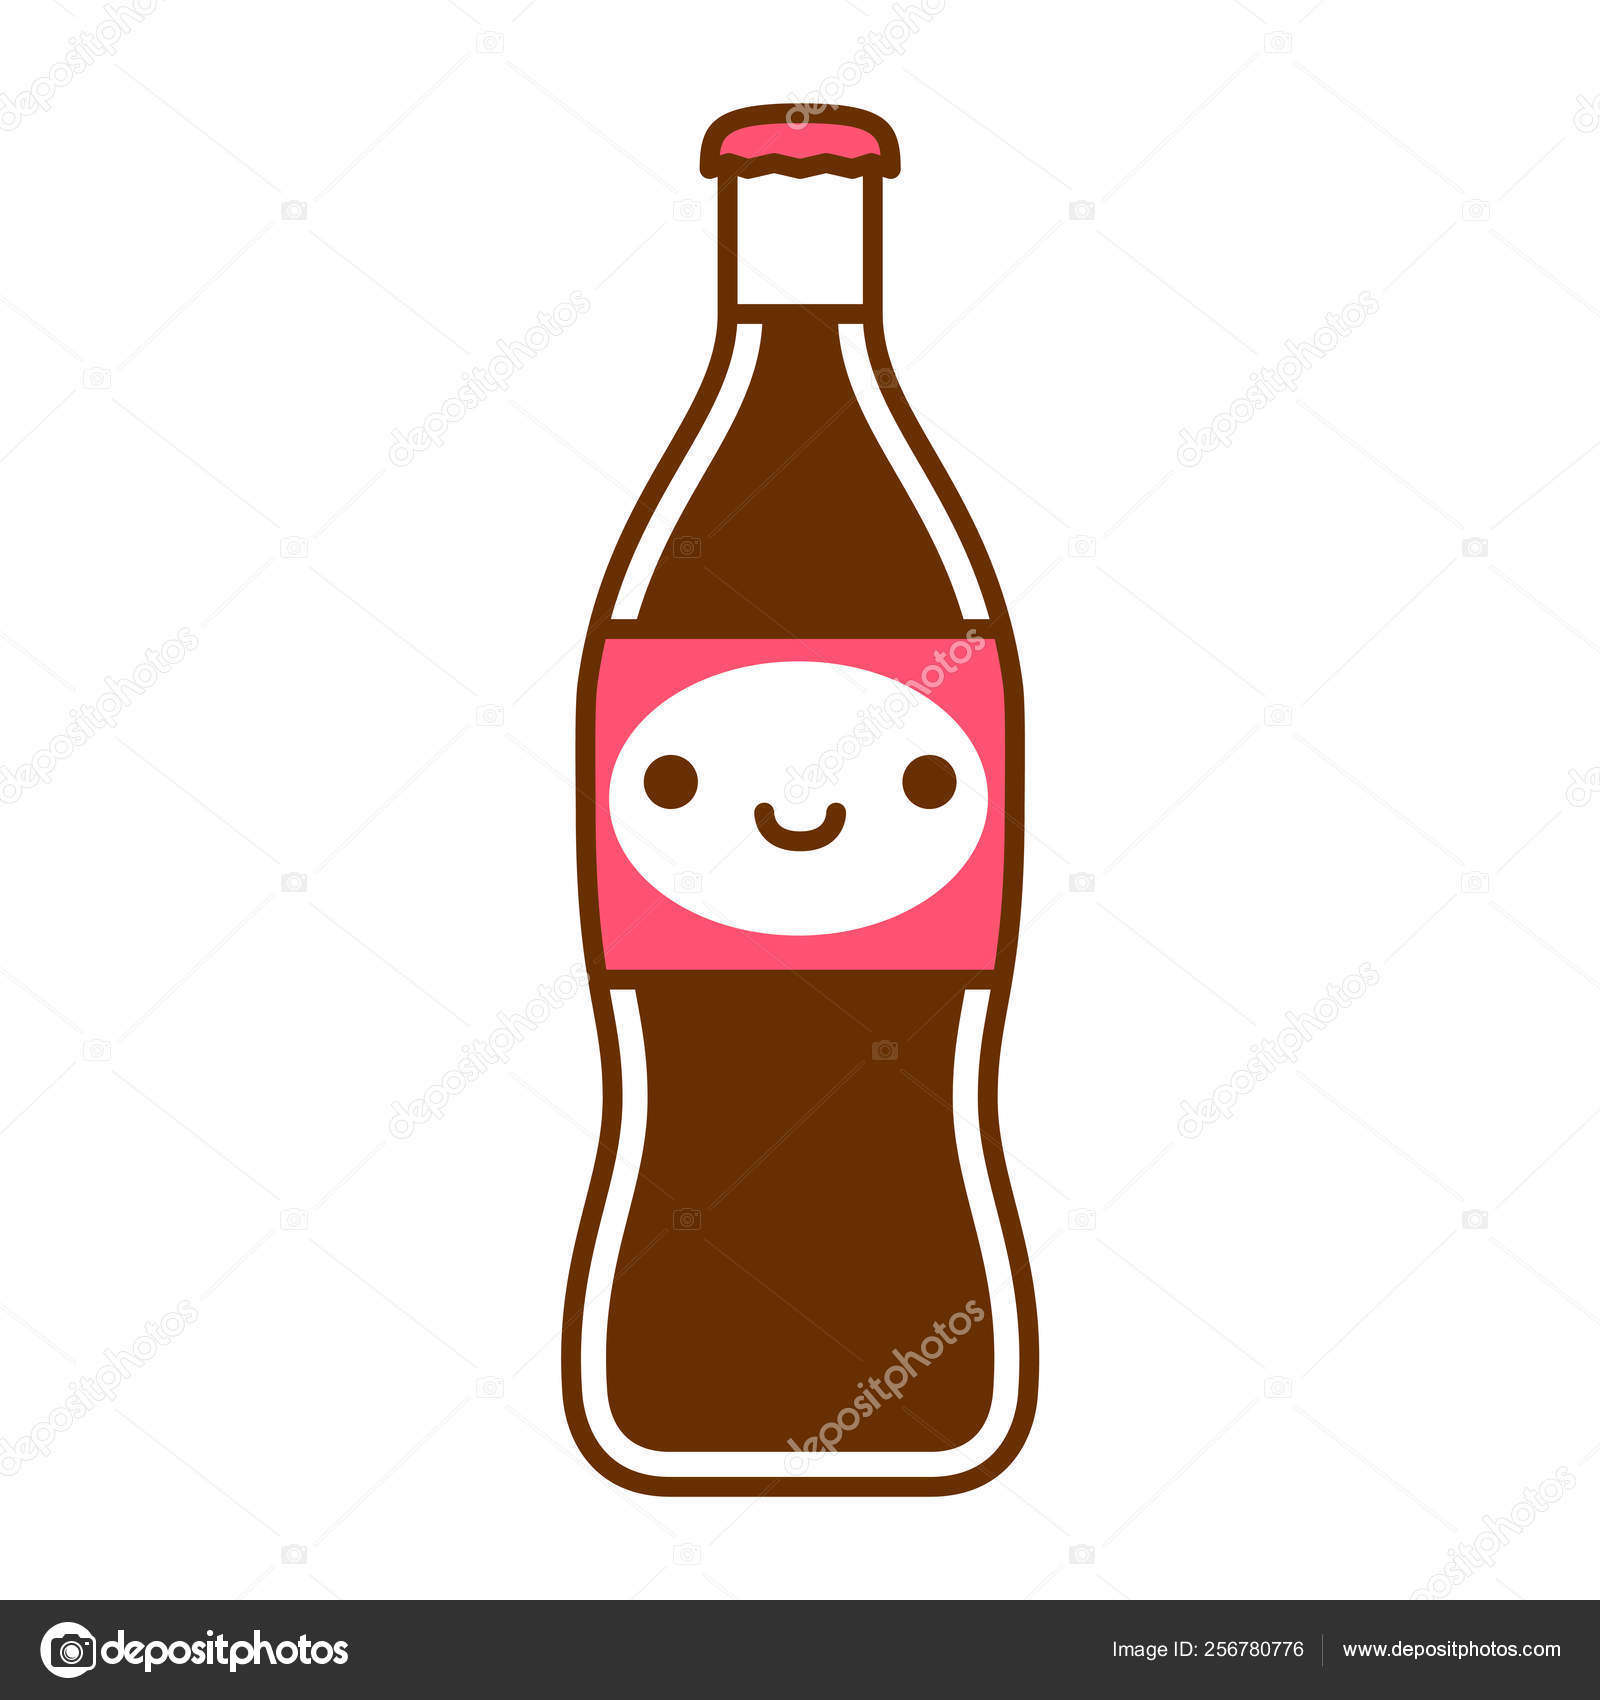 hight resolution of cartoon cute soda bottle spread isolated on white background stock illustration